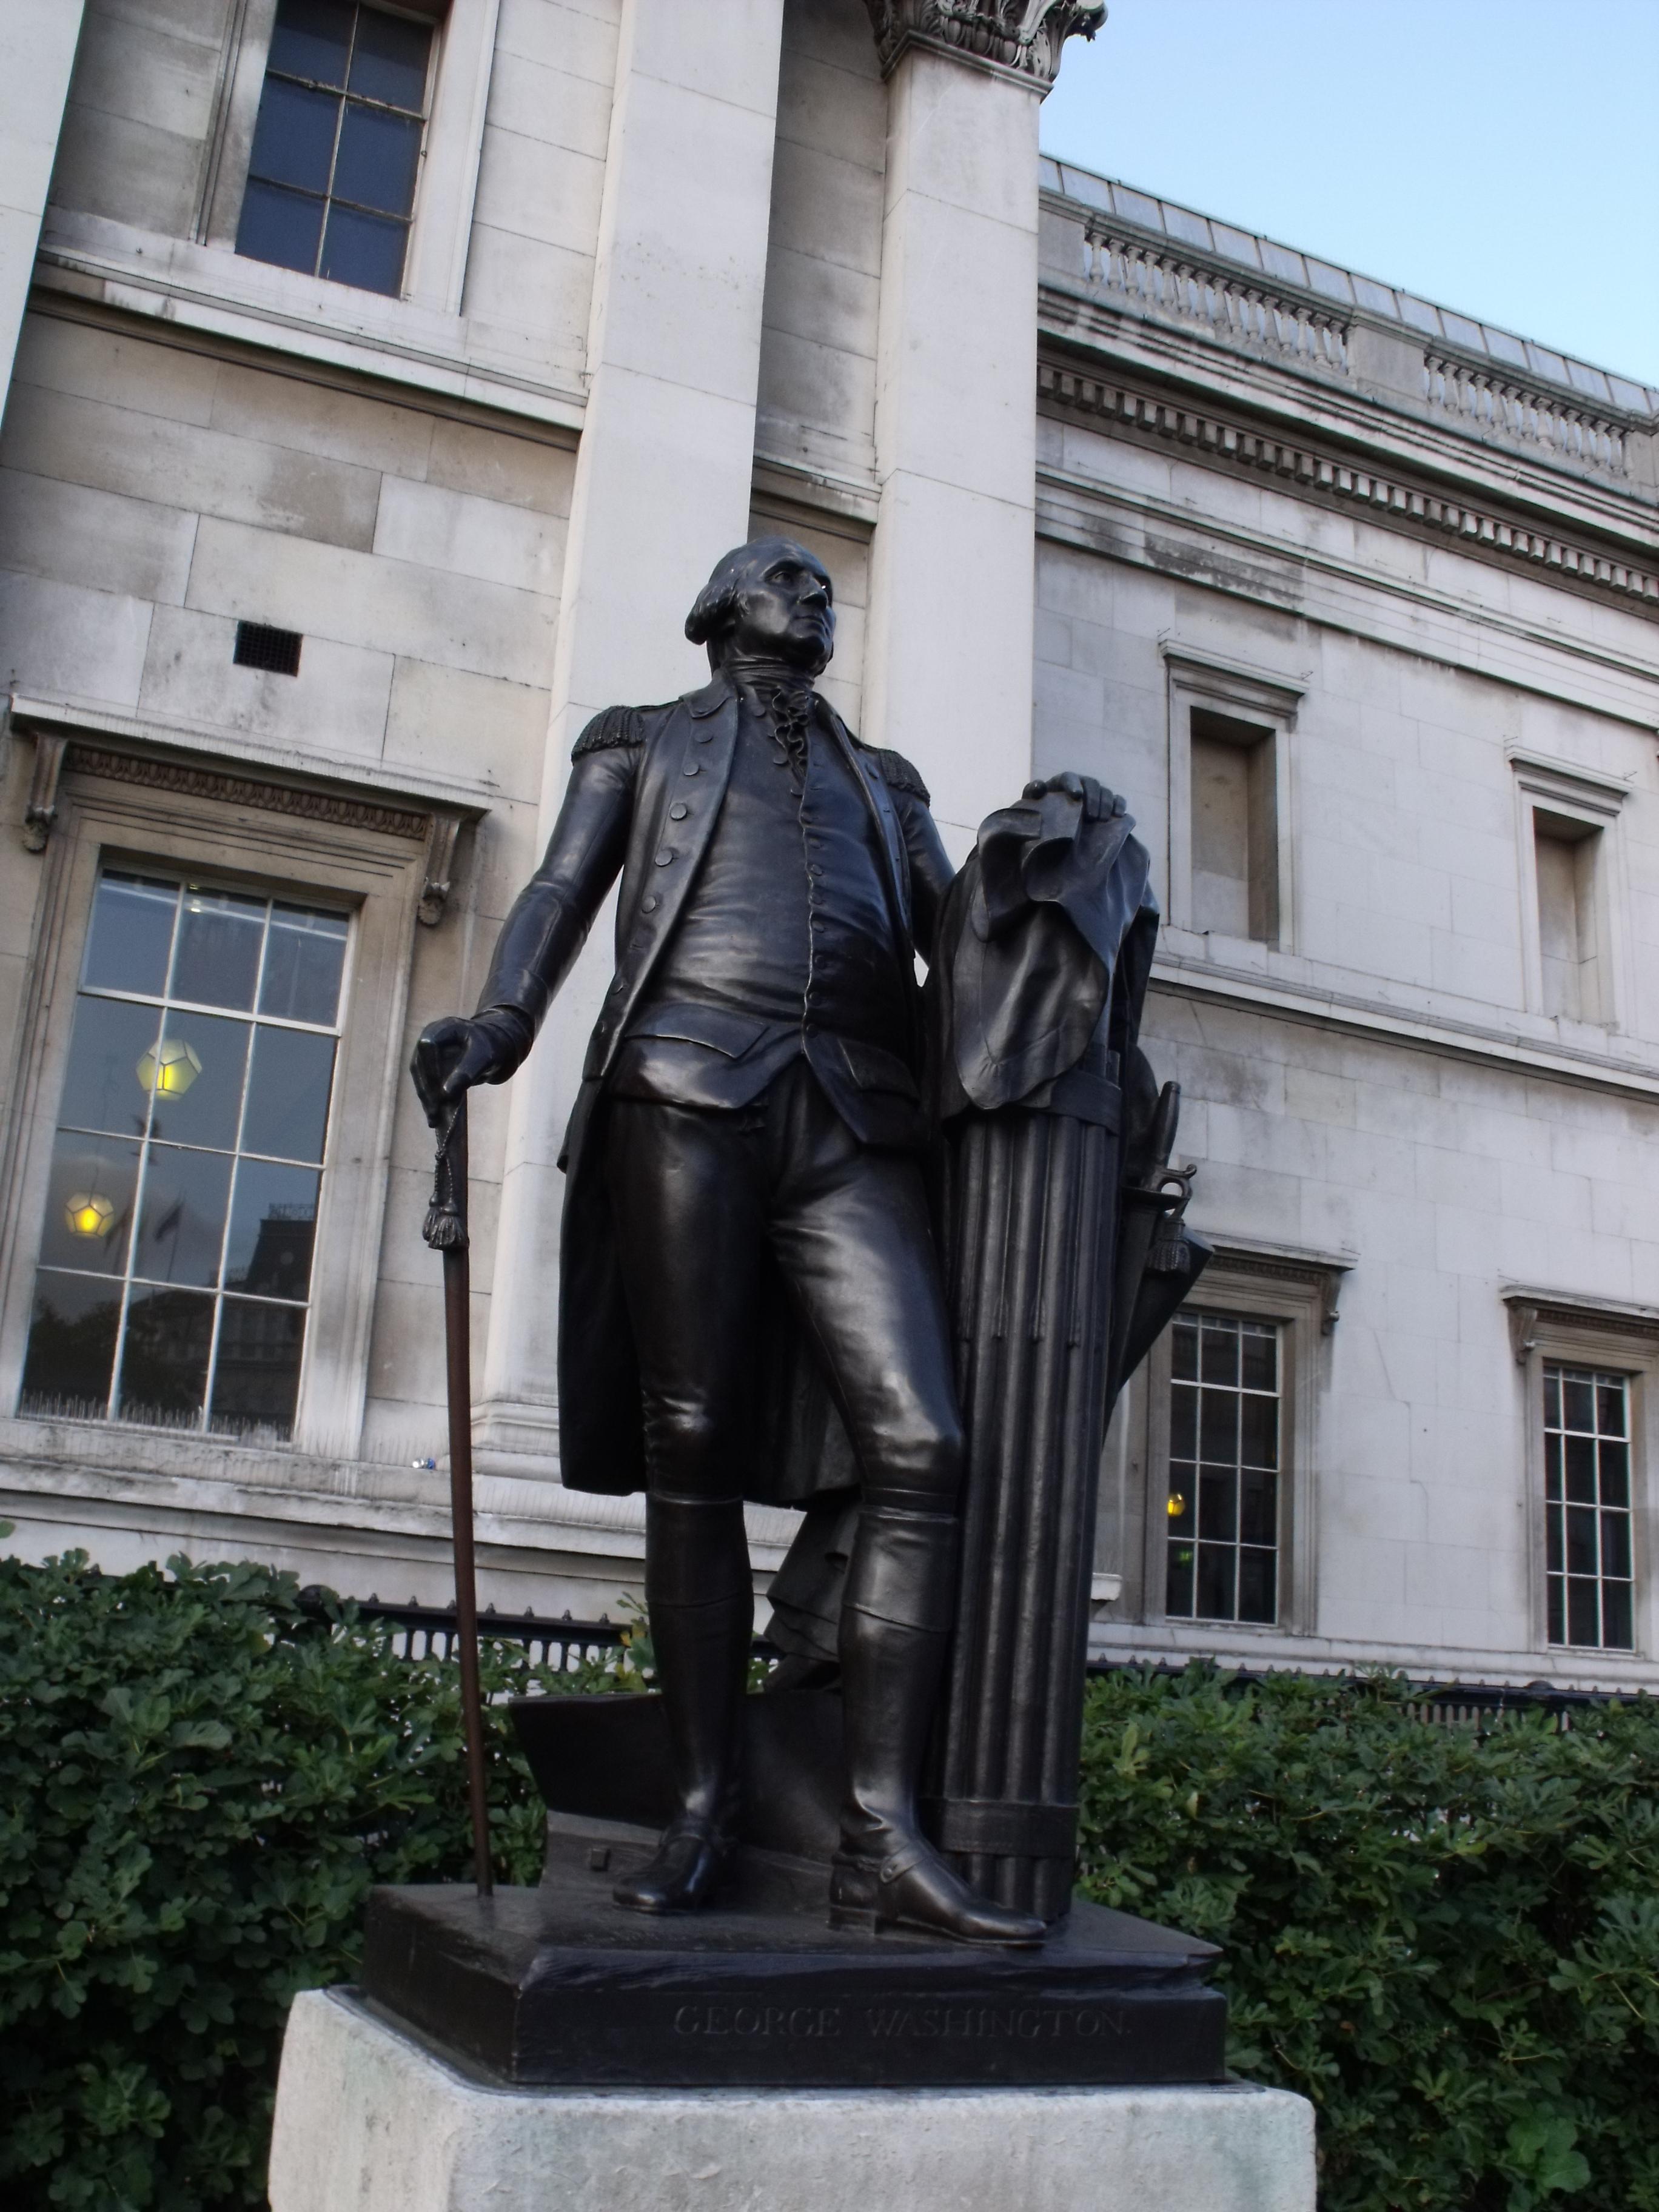 File:Statue of George Washington outside the National ...